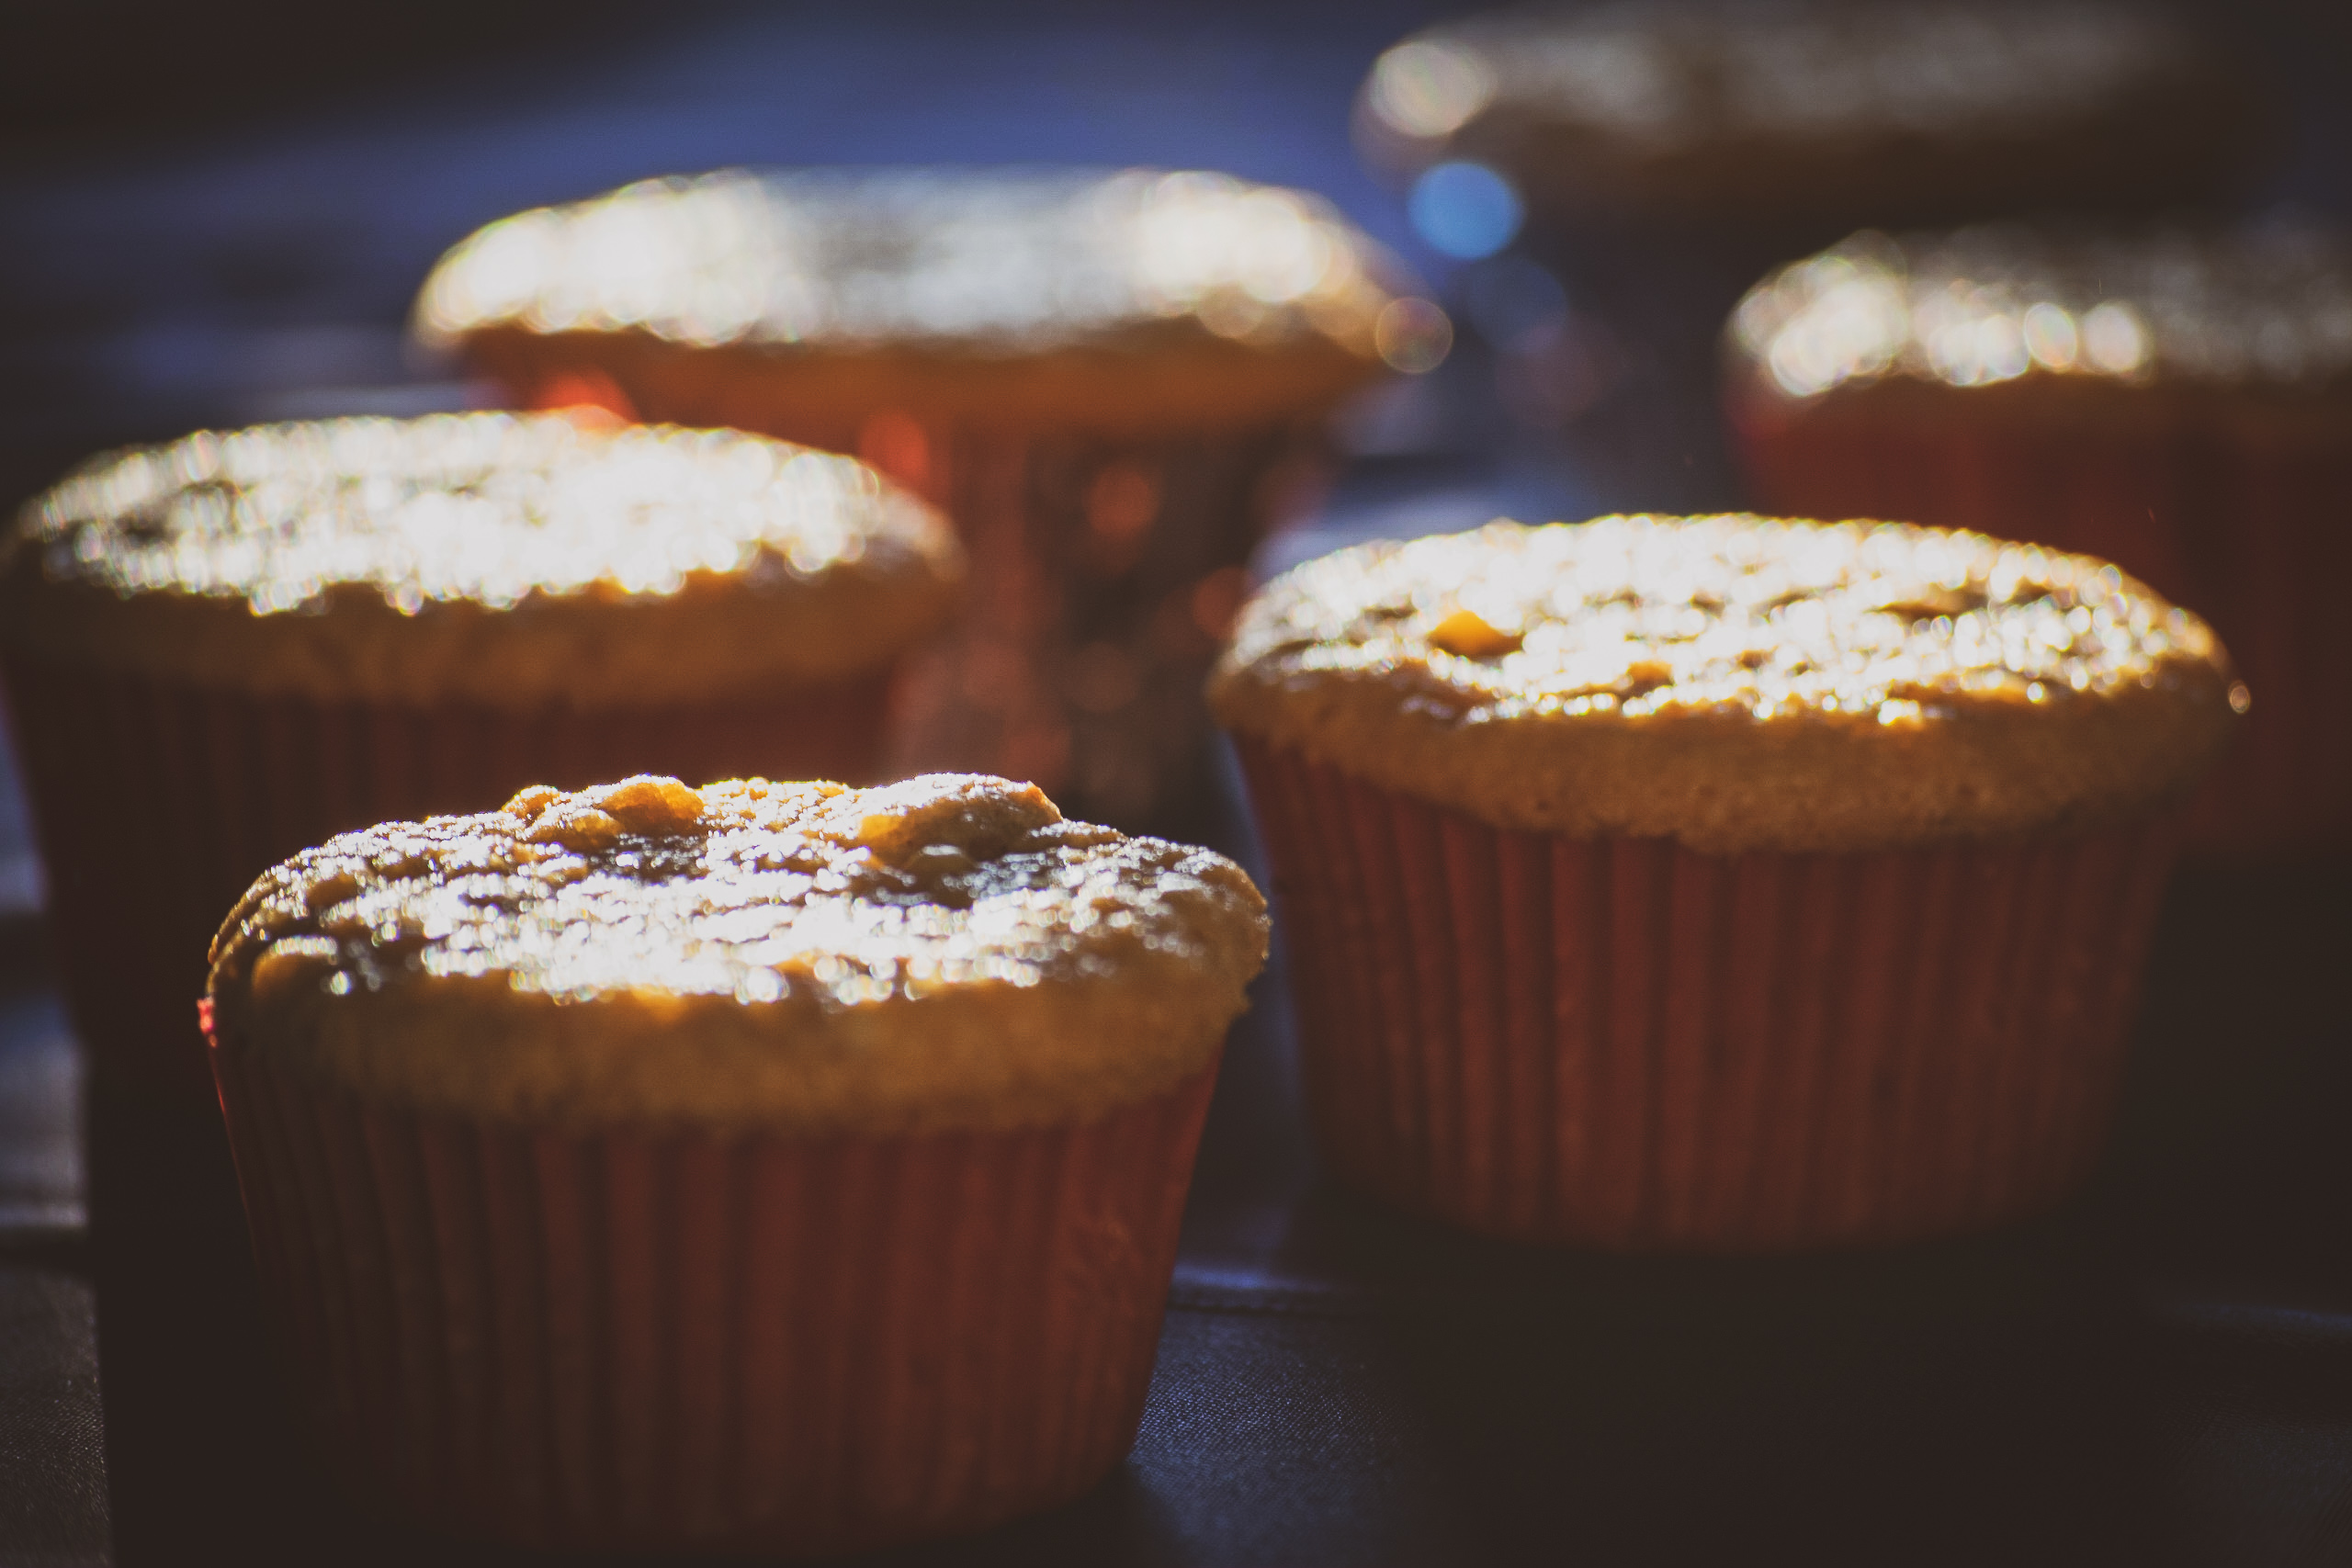 Christopher's Bakery | Dessert | Baked Good | Muffin | Vanilla Wafer